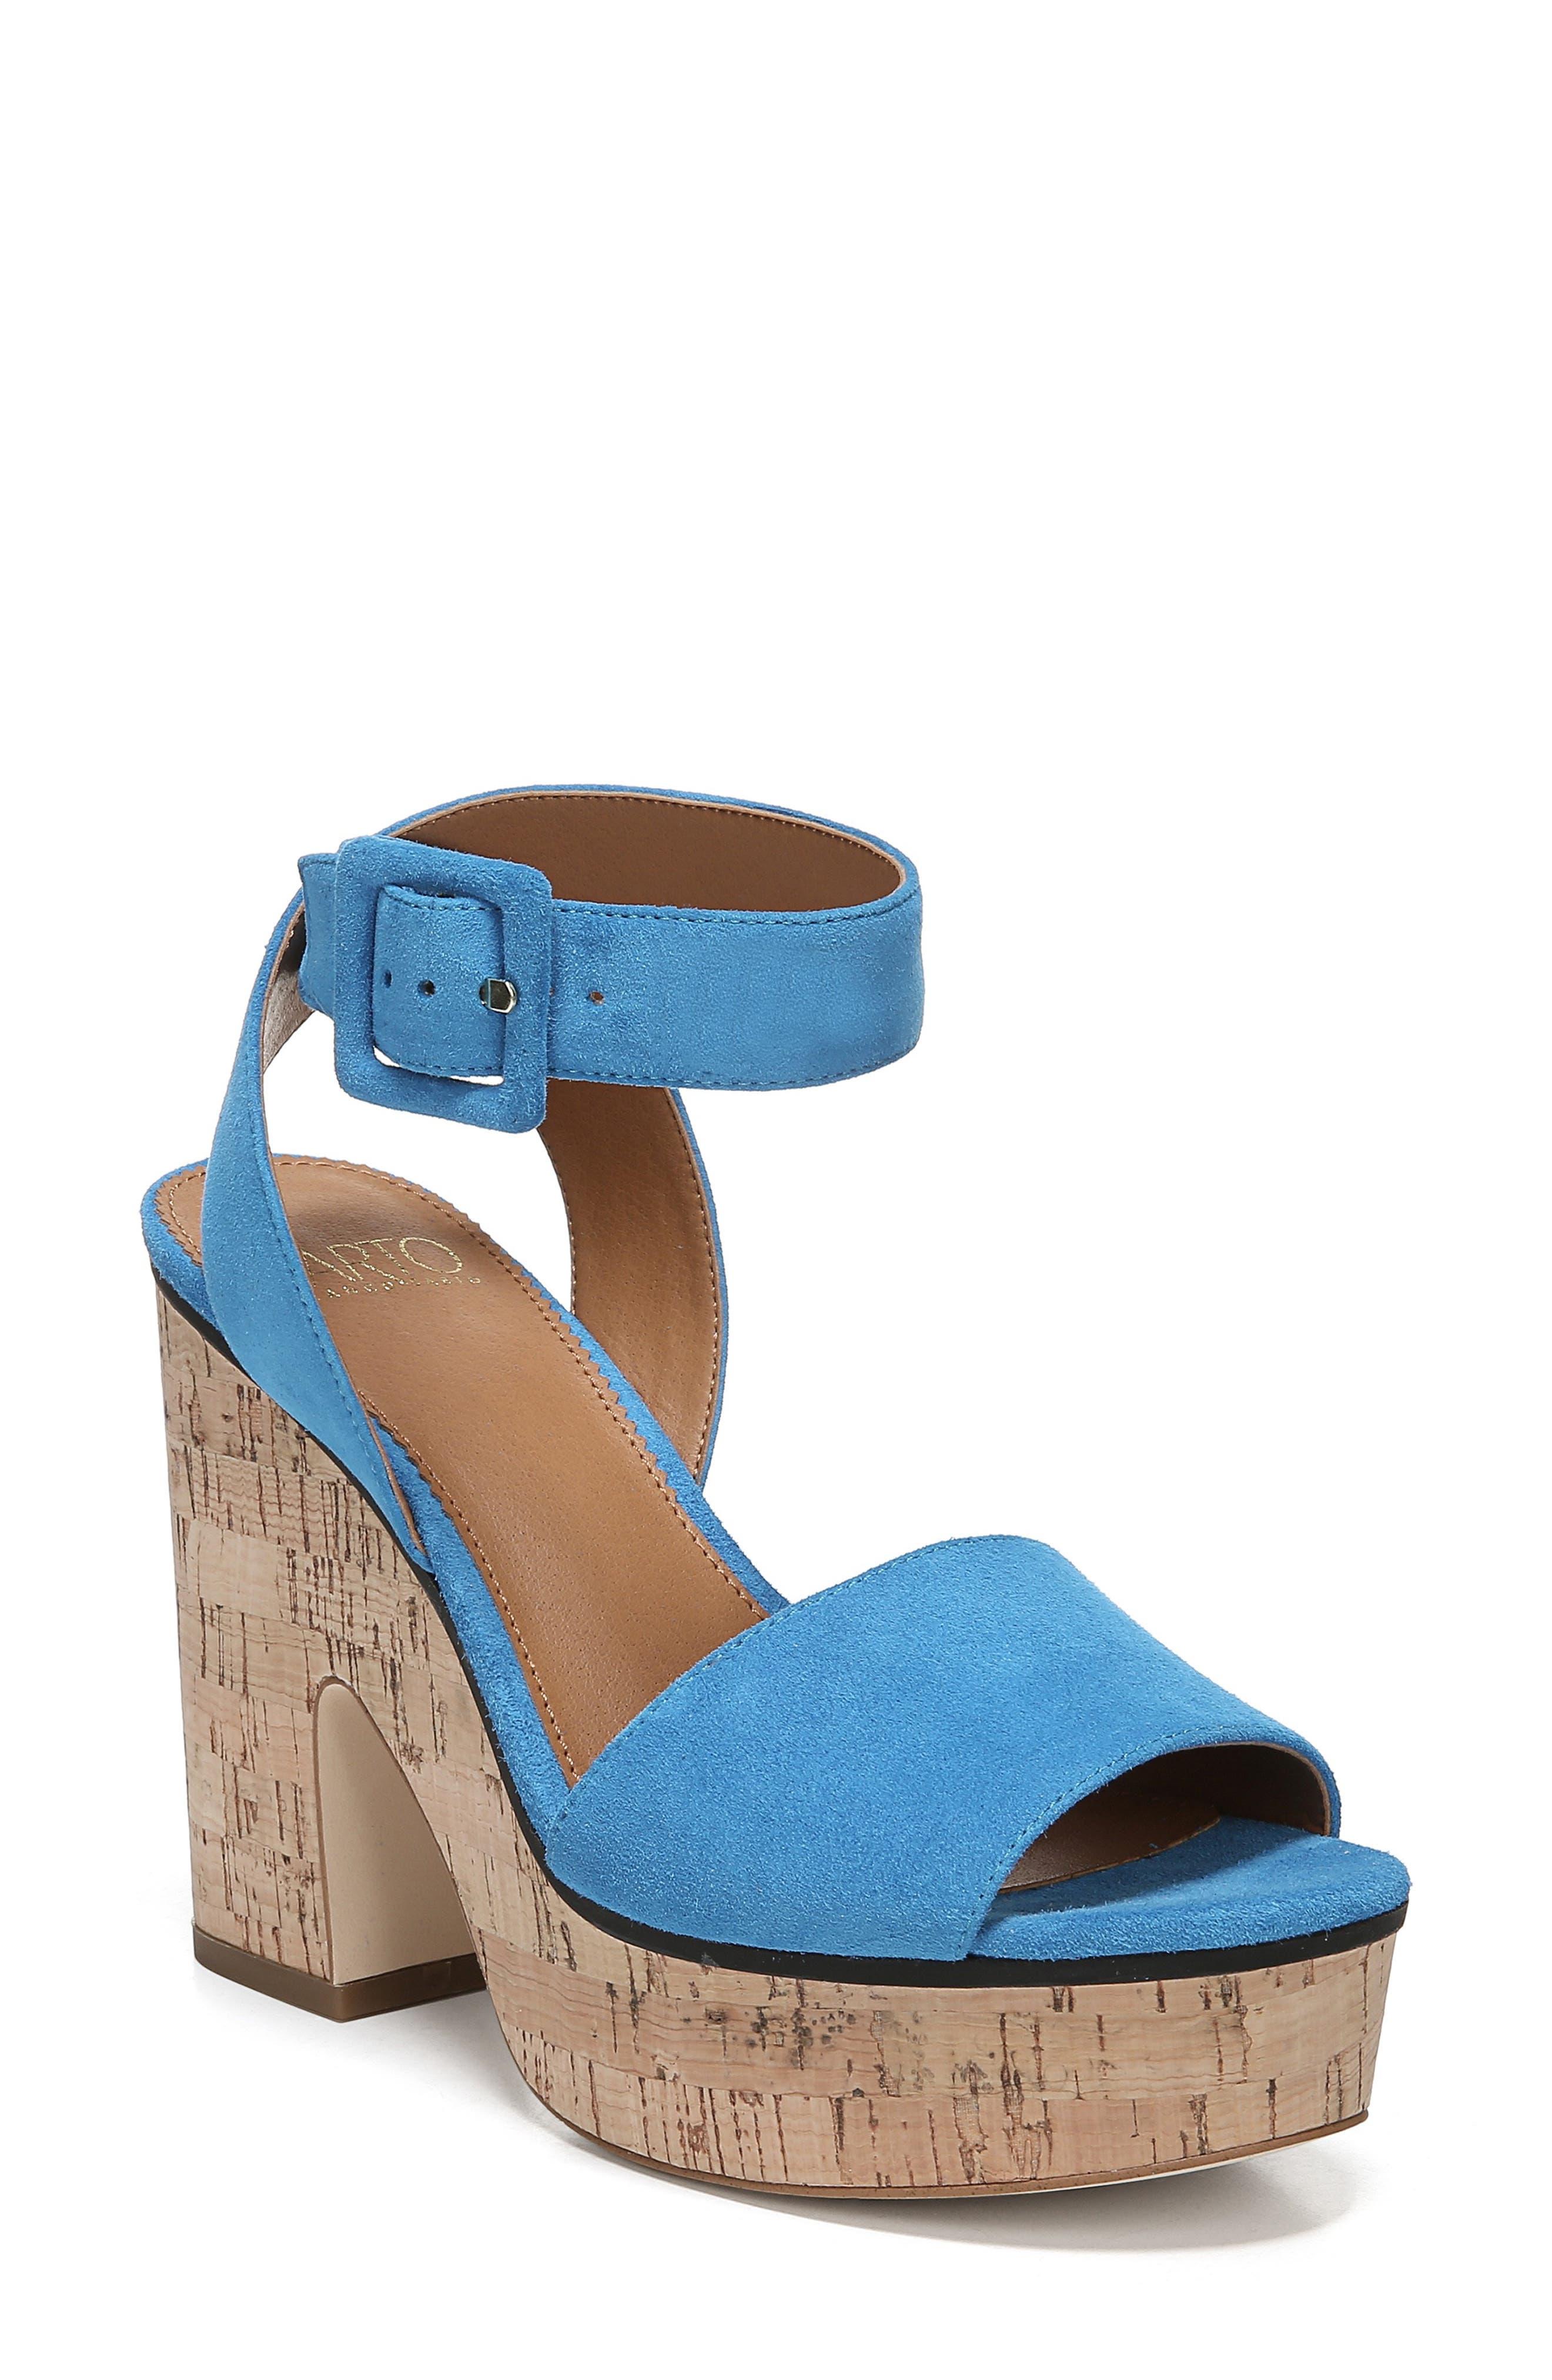 Sarto By Franco Sarto Franny Platform Sandal- Blue